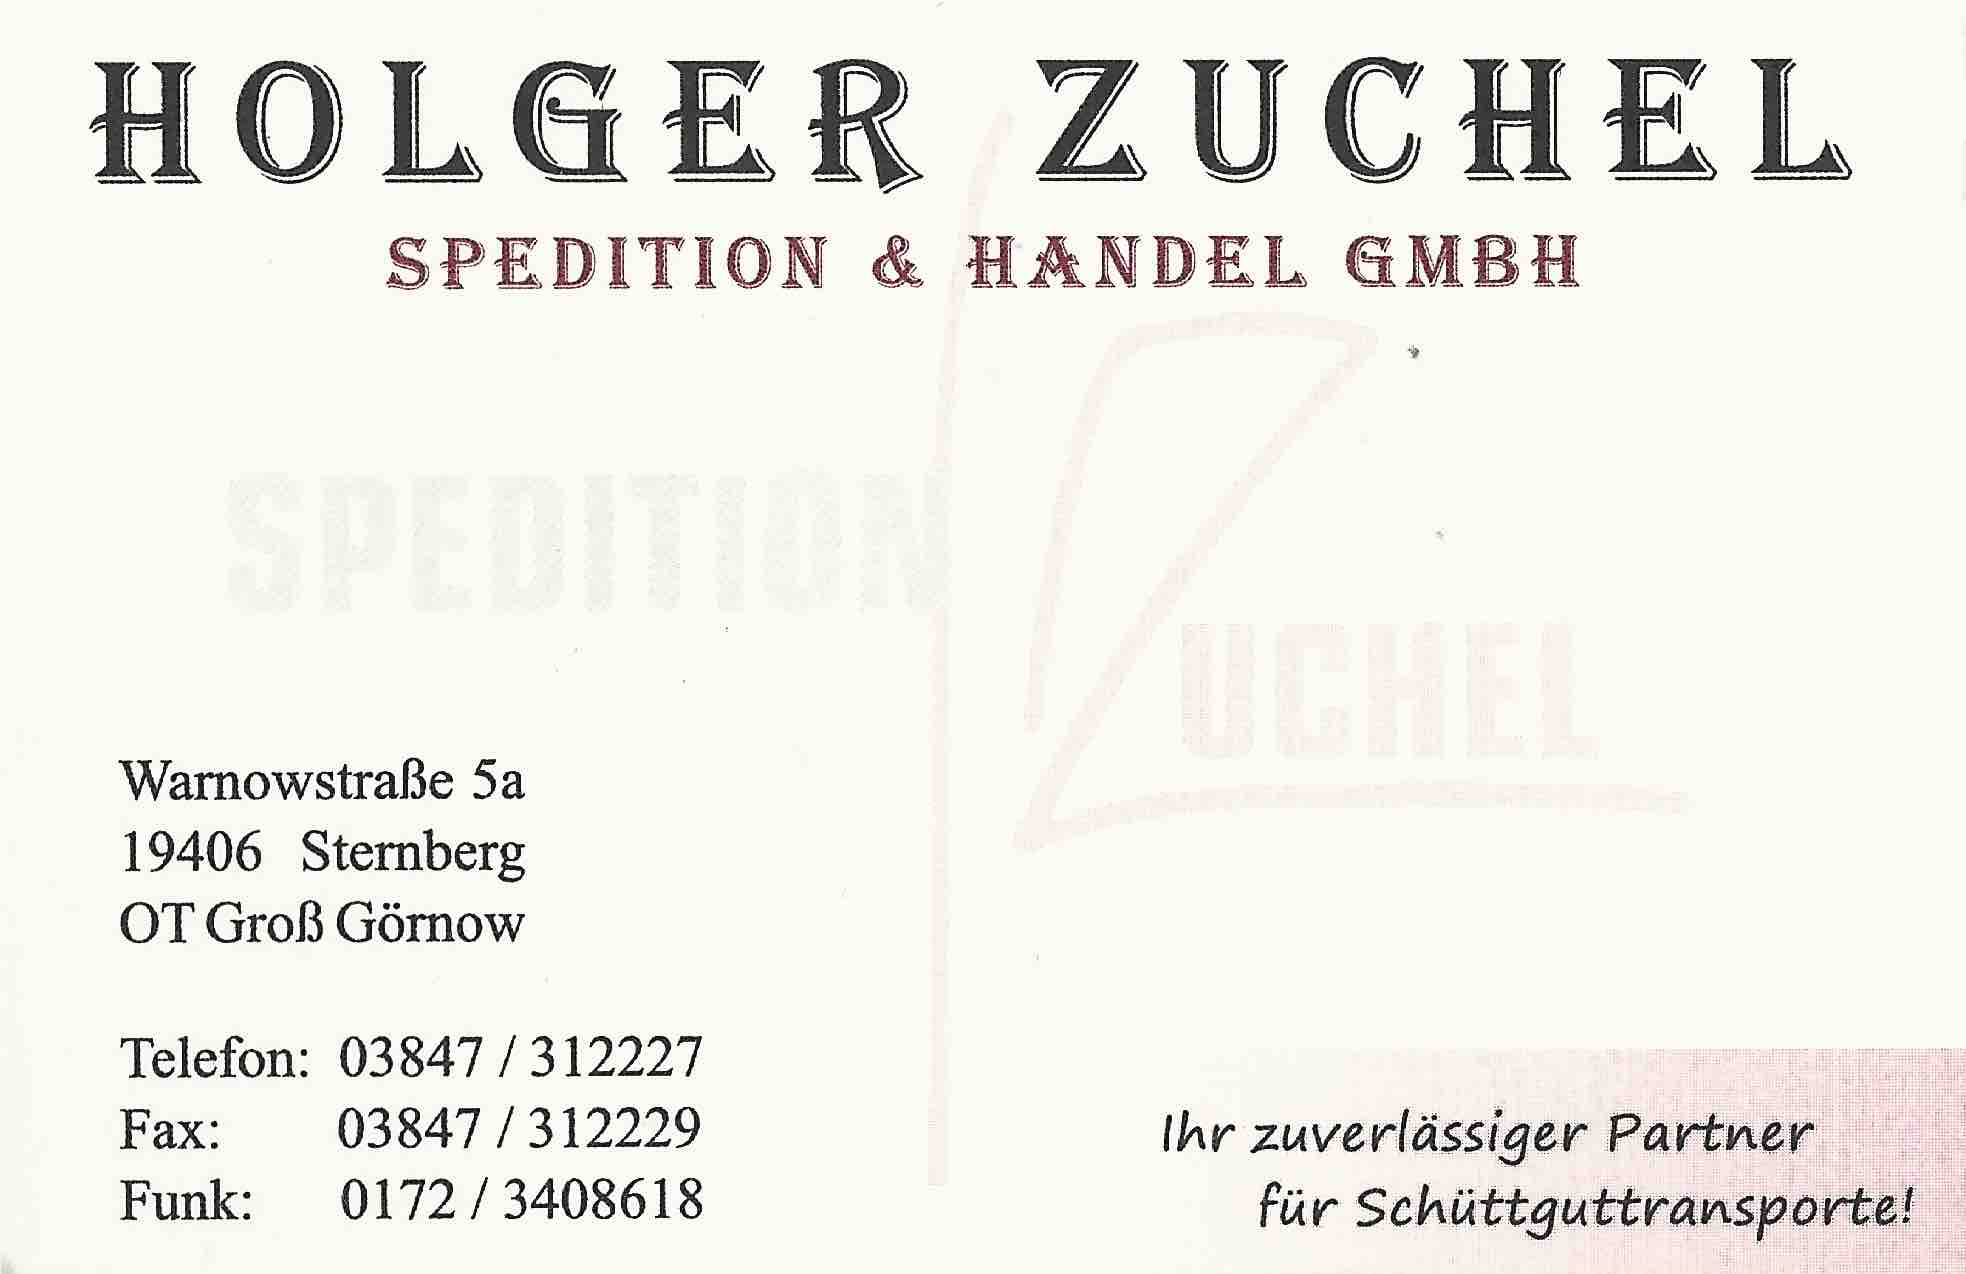 Holger Zuchel